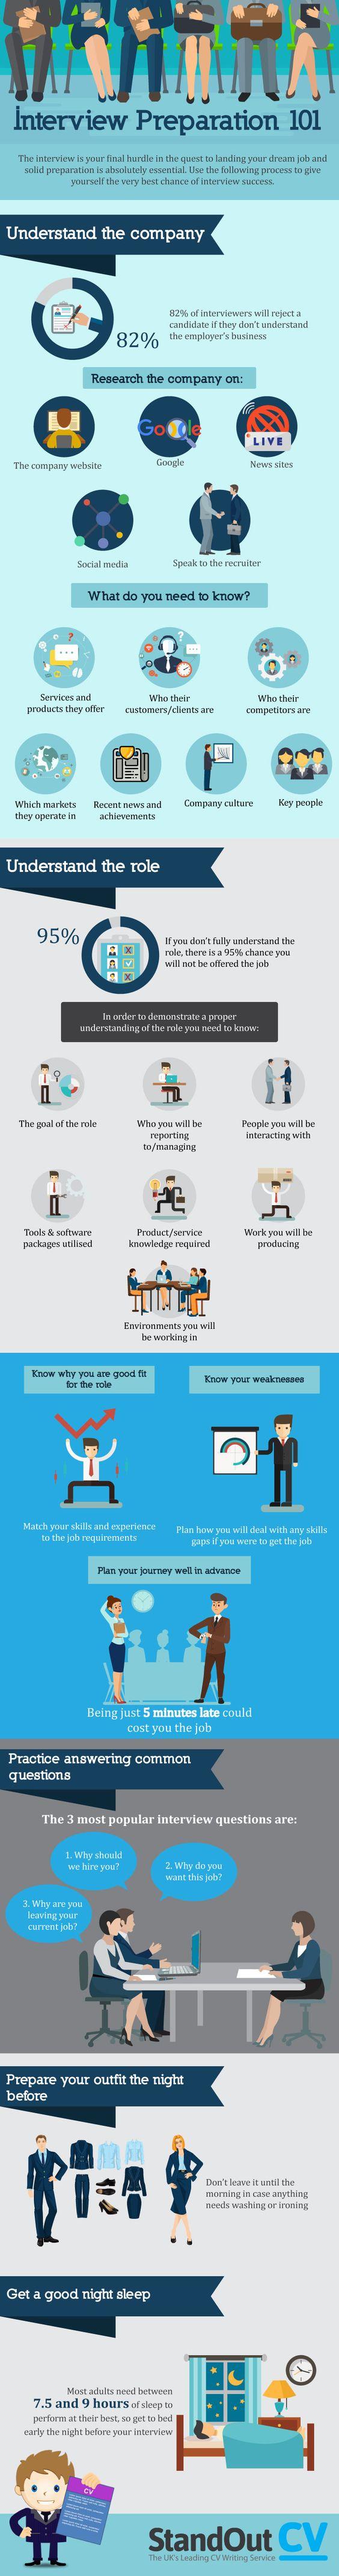 interview preparation infographic communication skills interview preparation 101 infographic career interview